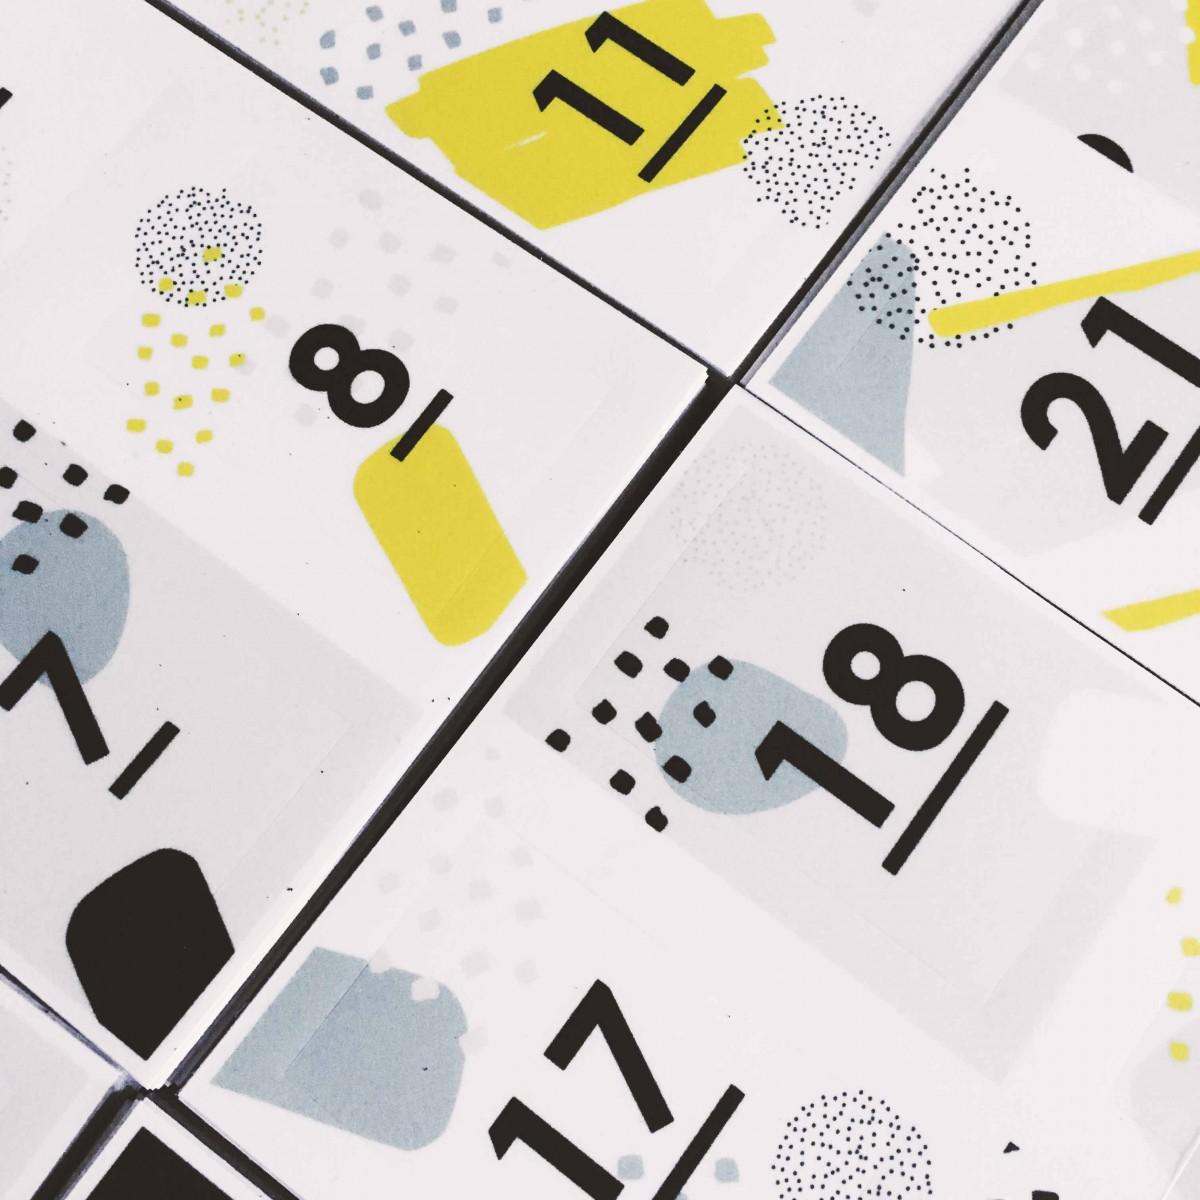 Adventskalender Sticker Set, Aufkleber-Zahlen